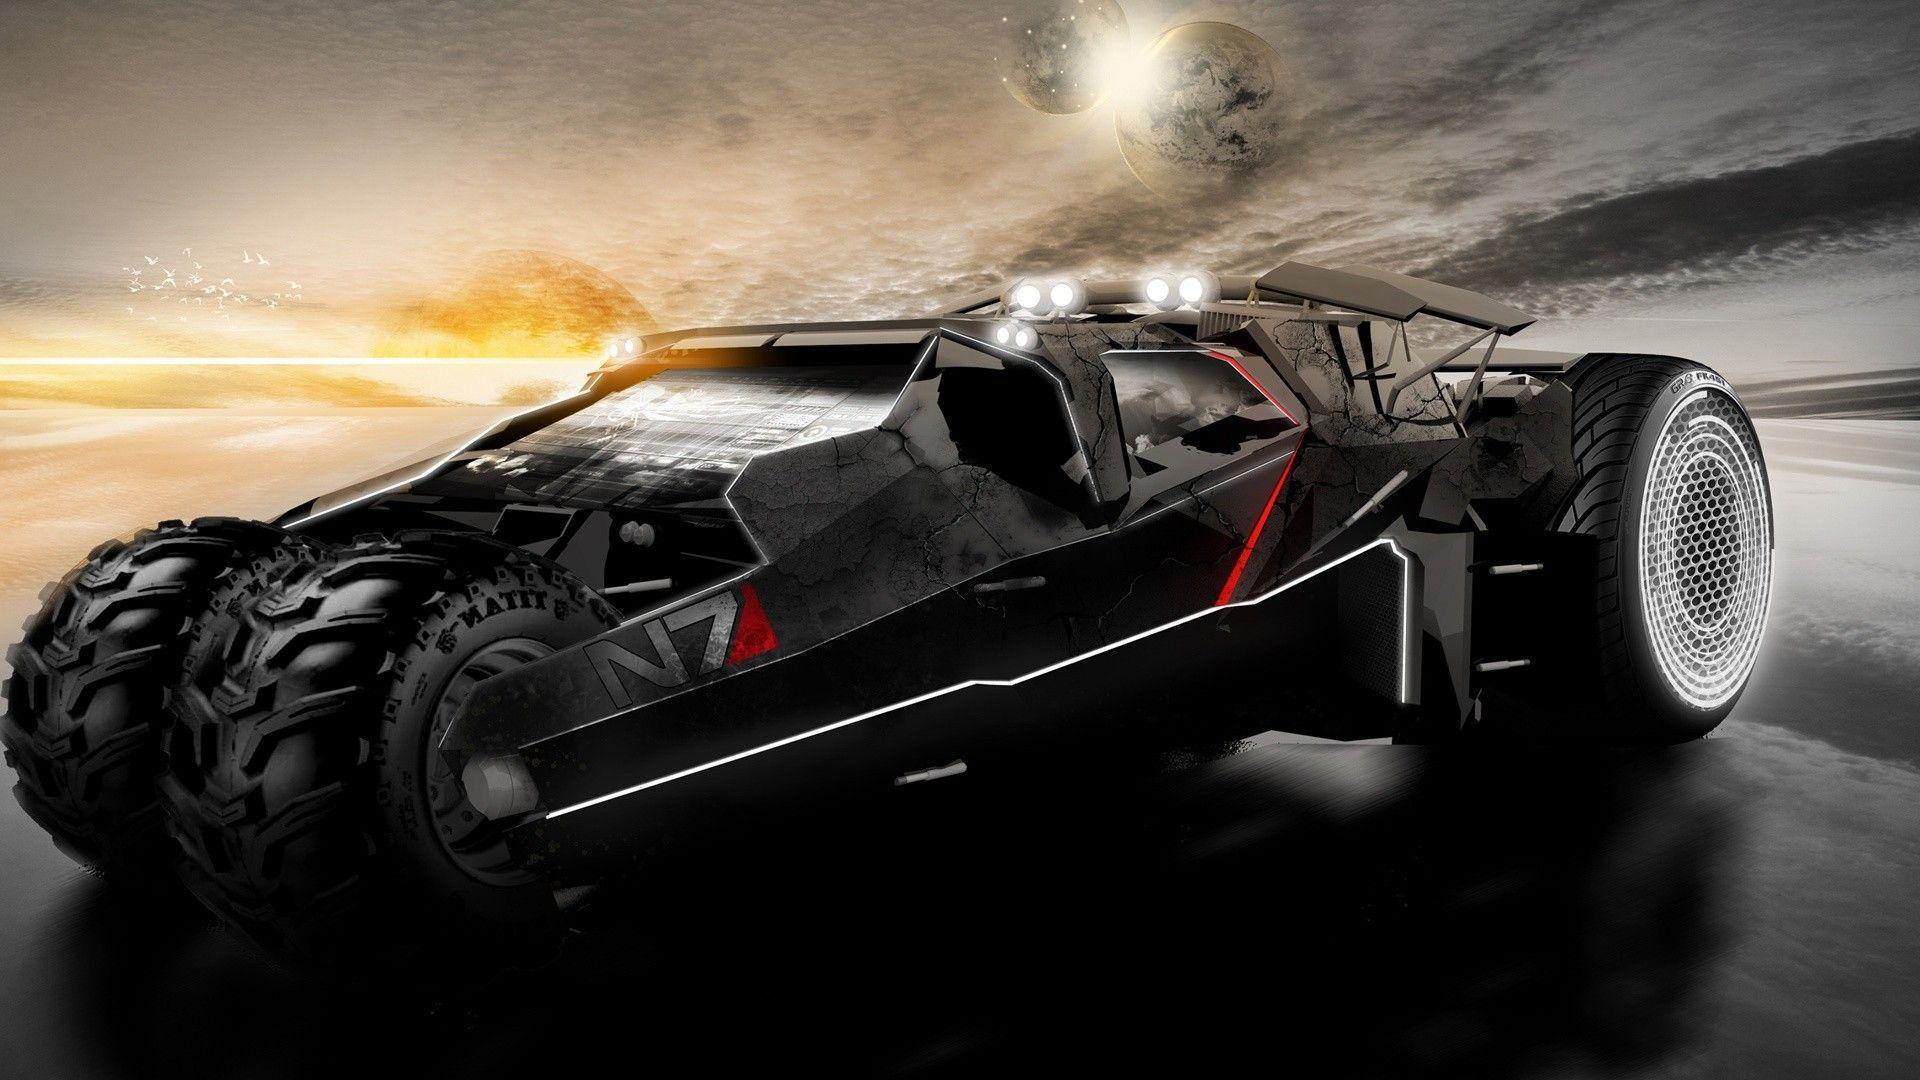 hd wallpapers 1080p cars fbpapa - Super Cool Cars Wallpapers Hd